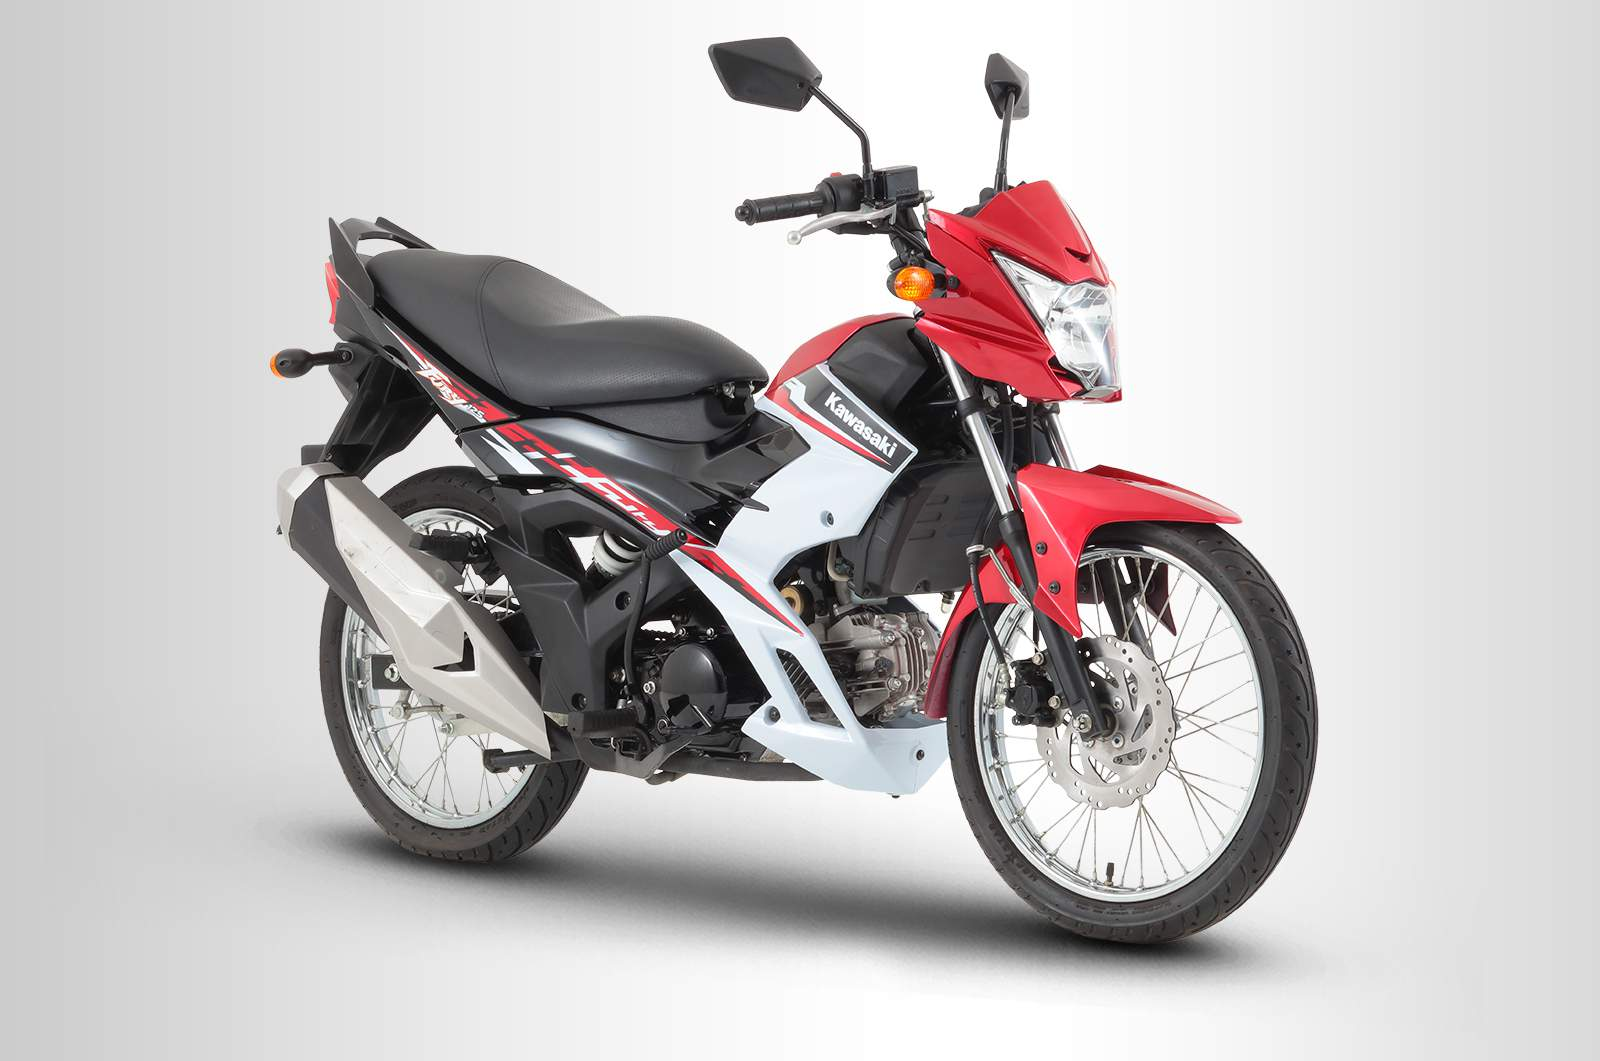 Motortrade Philippines Best Motorcycle Dealer Kawasaki Fury 125